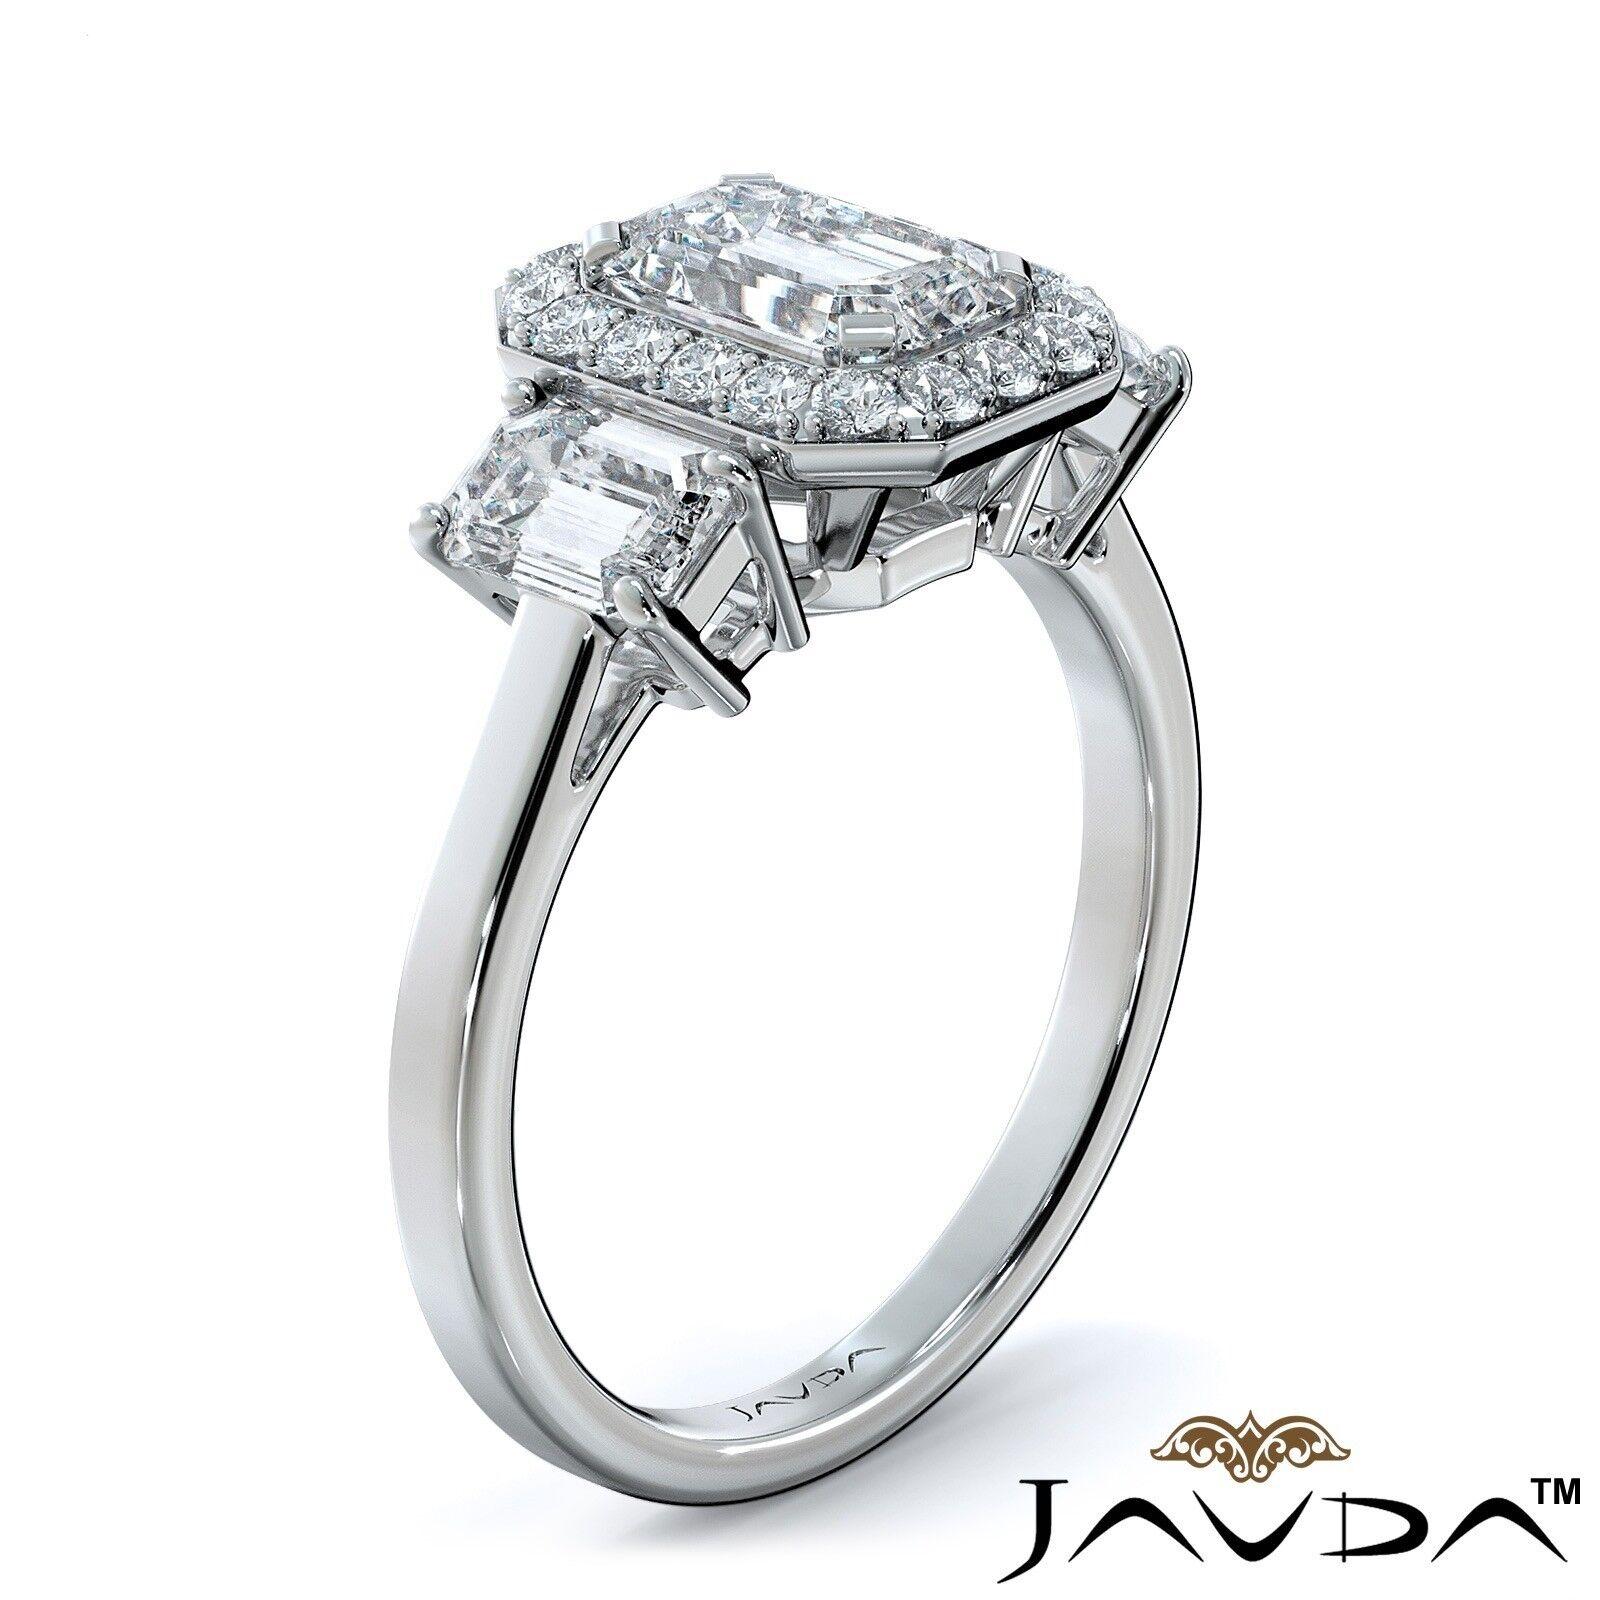 1.55ctw 3 Stone Halo Pave Emerald Diamond Engagement Ring GIA F-SI2 White Gold 1